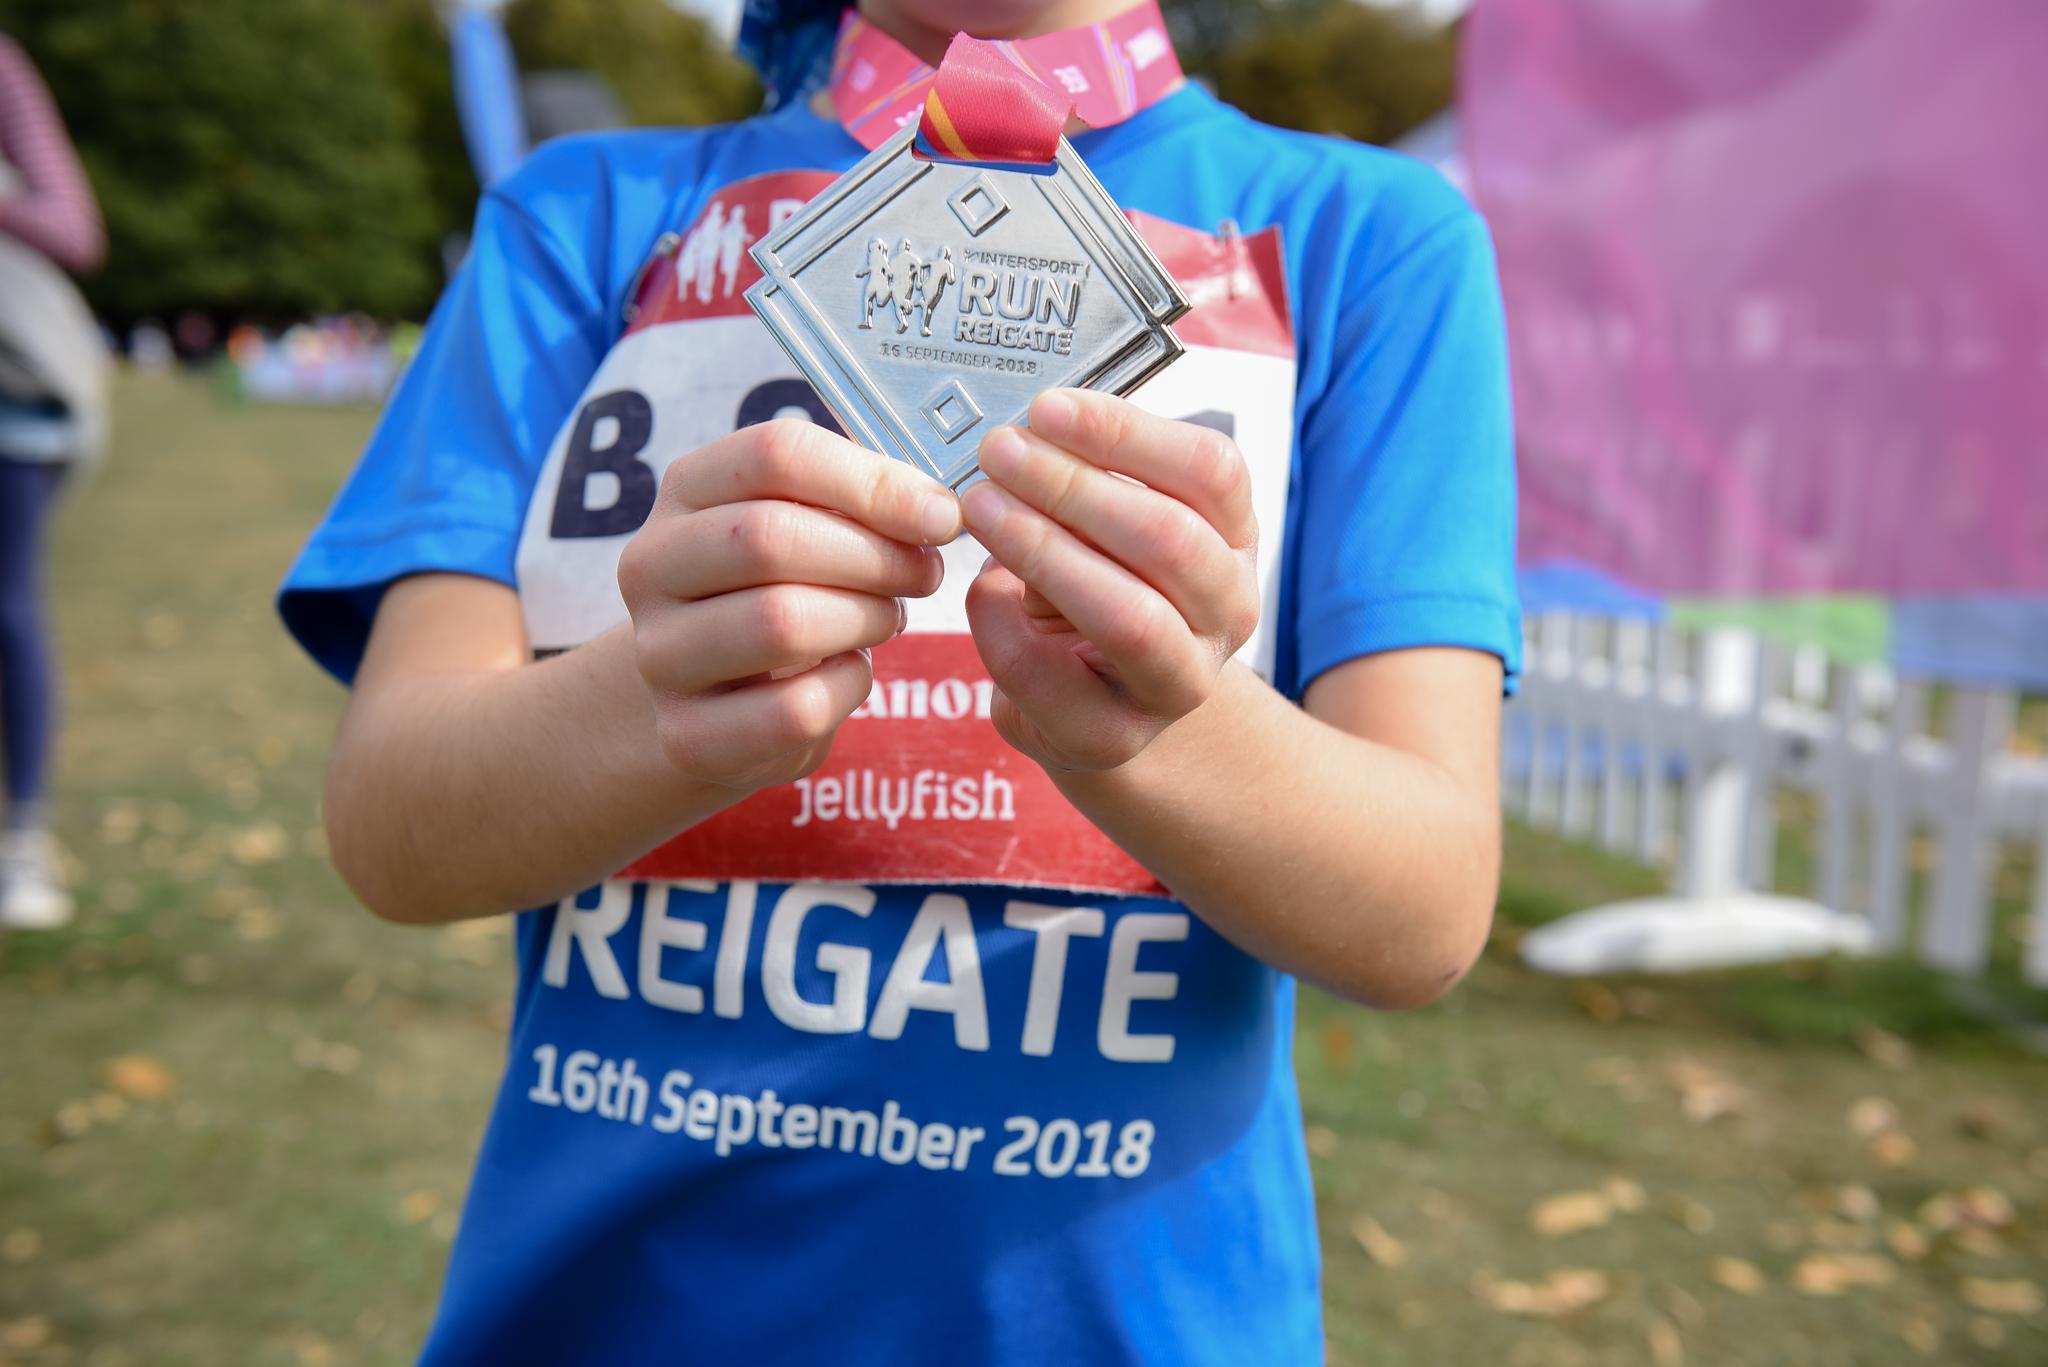 Run Reigate \u002D Canon Kids Race - cover image